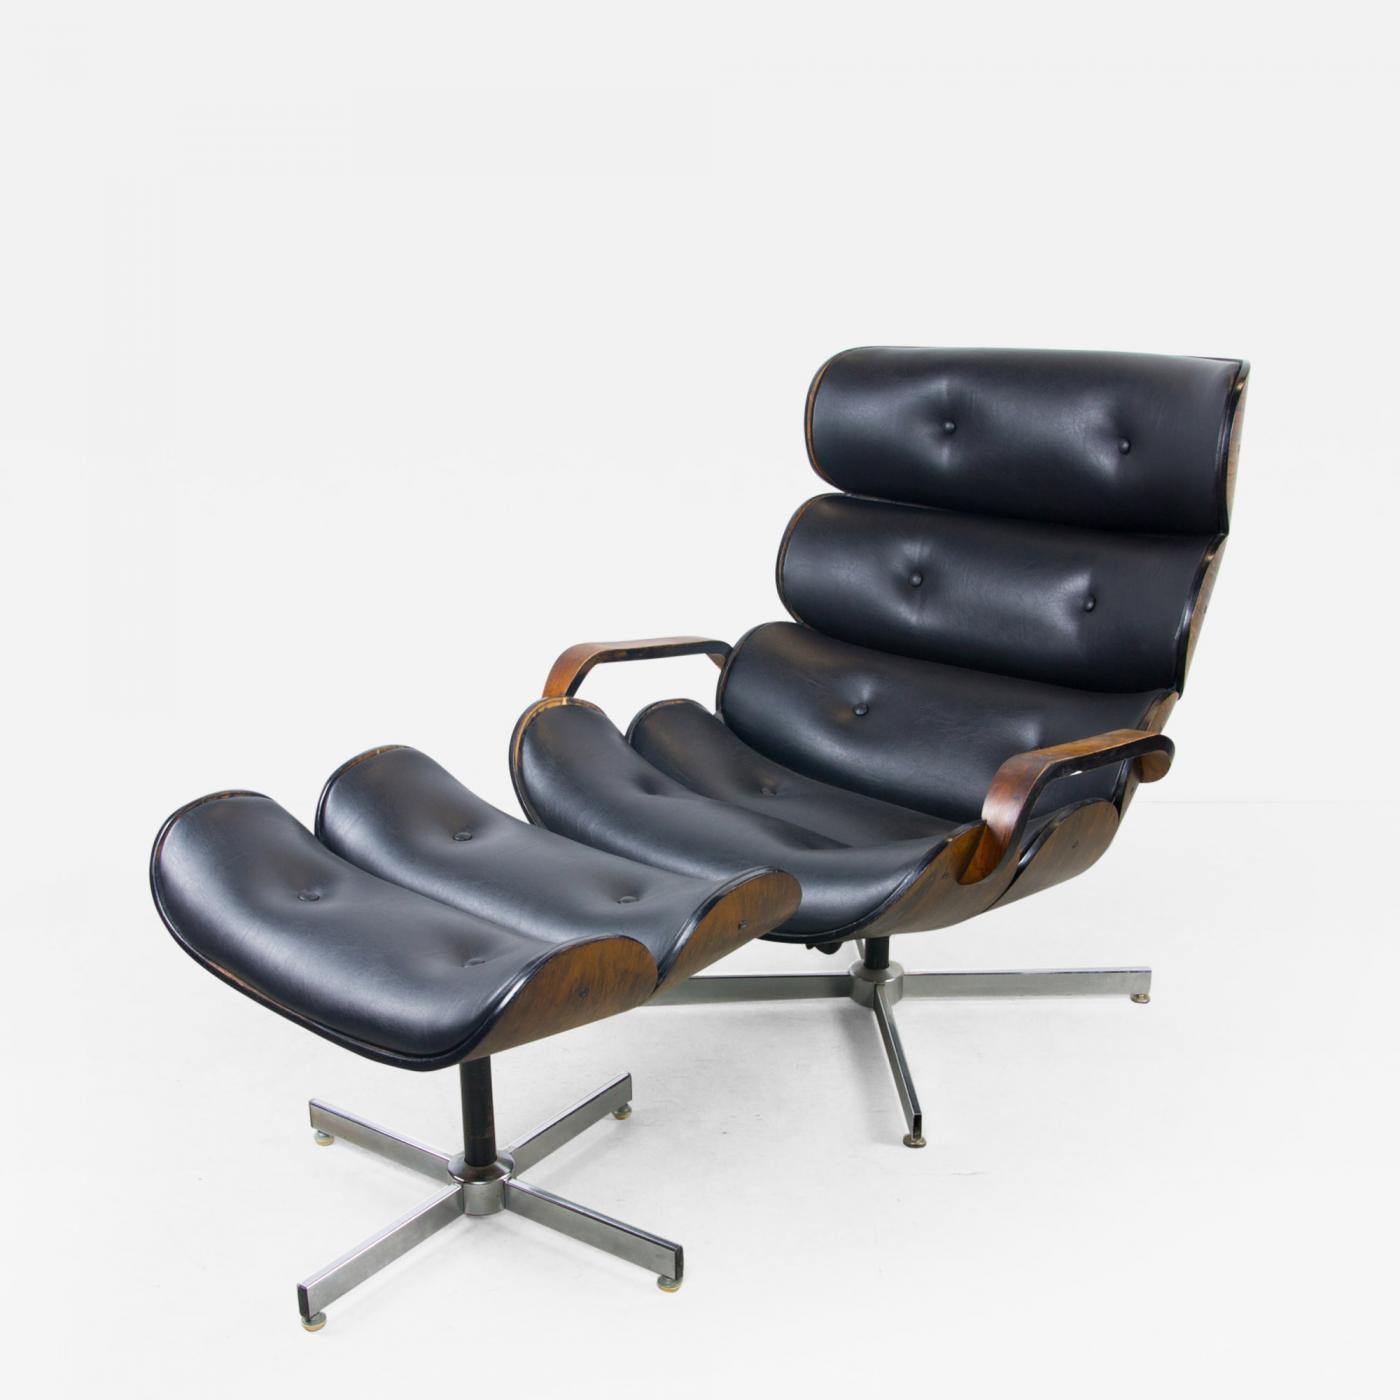 Groovy Plycraft Lounge Chair Ibusinesslaw Wood Chair Design Ideas Ibusinesslaworg